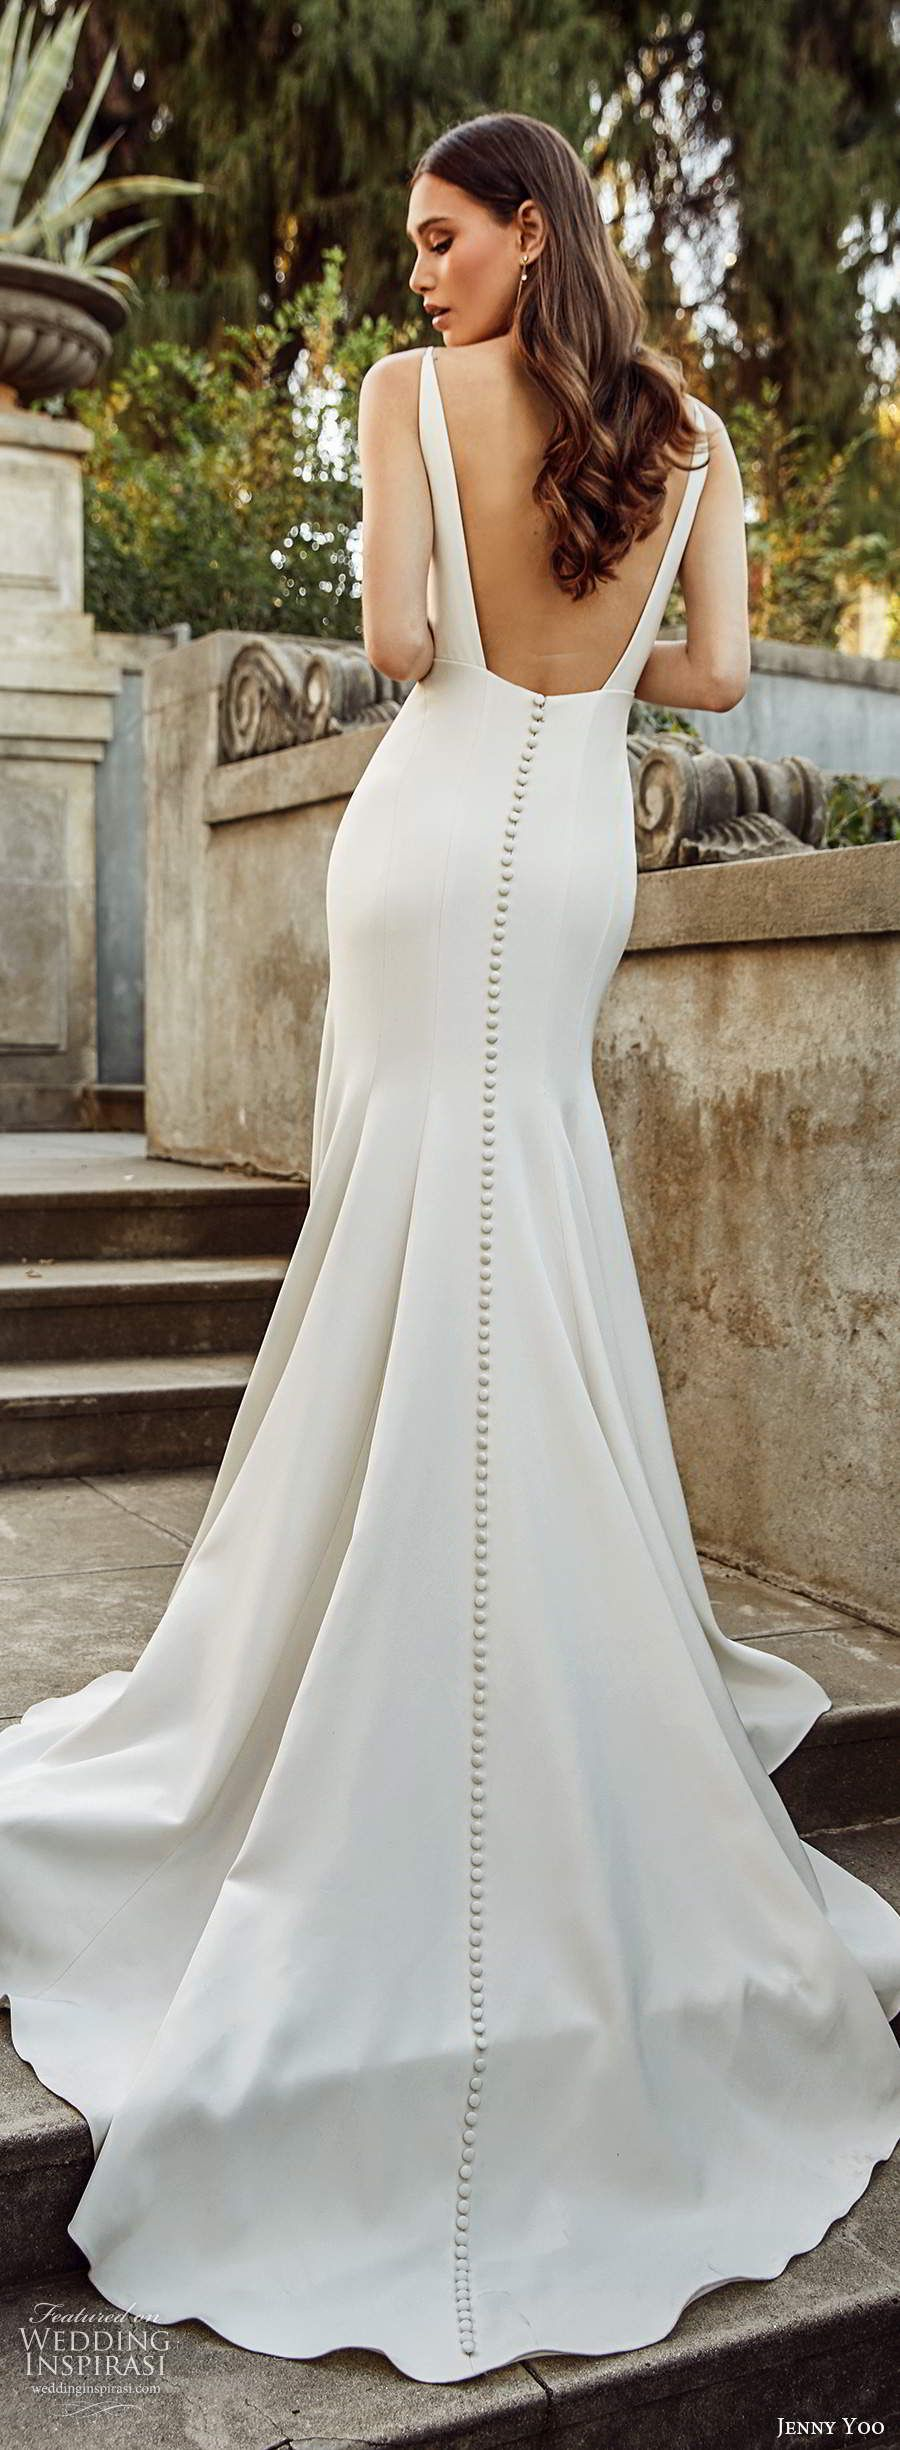 Jenny Yoo Collection Spring 2020 Wedding Dresses Wedding Inspirasi Wedding Dress Low Back Wedding Dresses Simple Minimalist Wedding Dresses [ 2450 x 900 Pixel ]